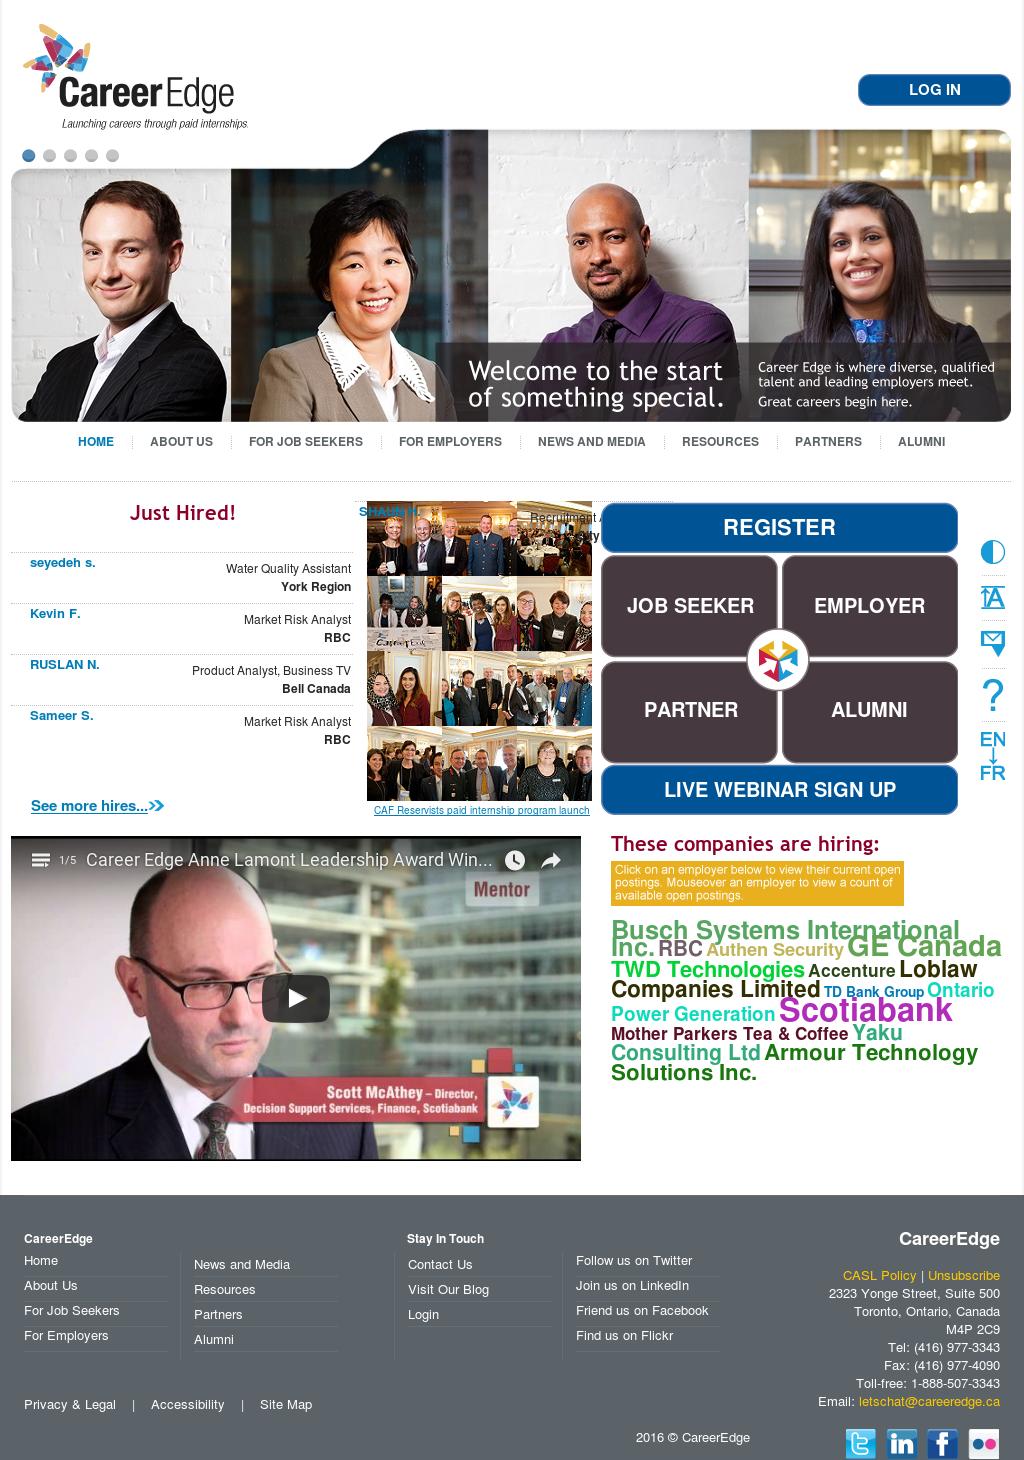 CareerEdge Competitors, Revenue and Employees - Owler